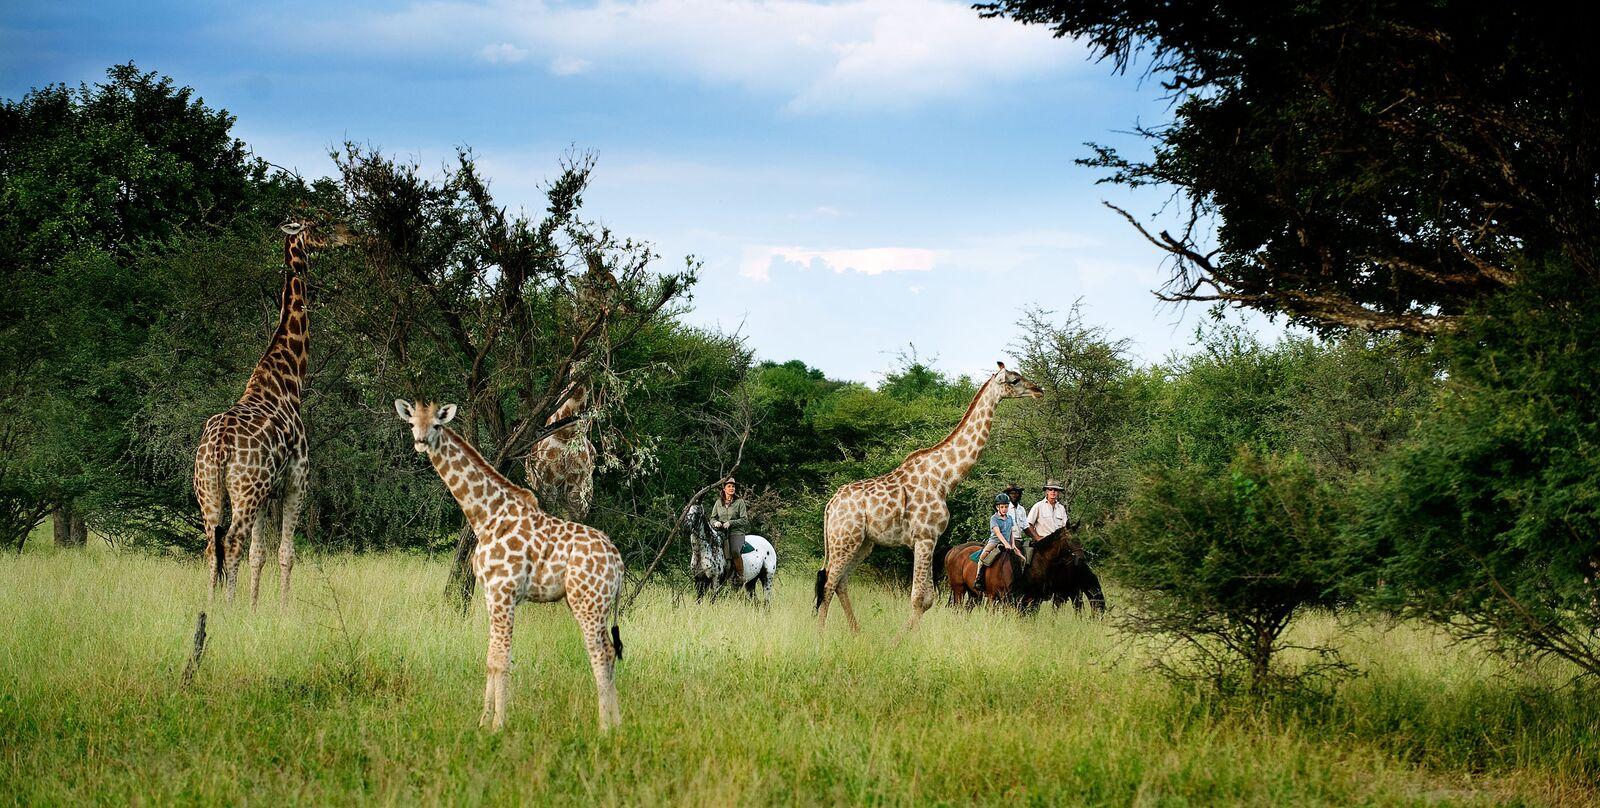 Beginners op een safari te paard in Afrika